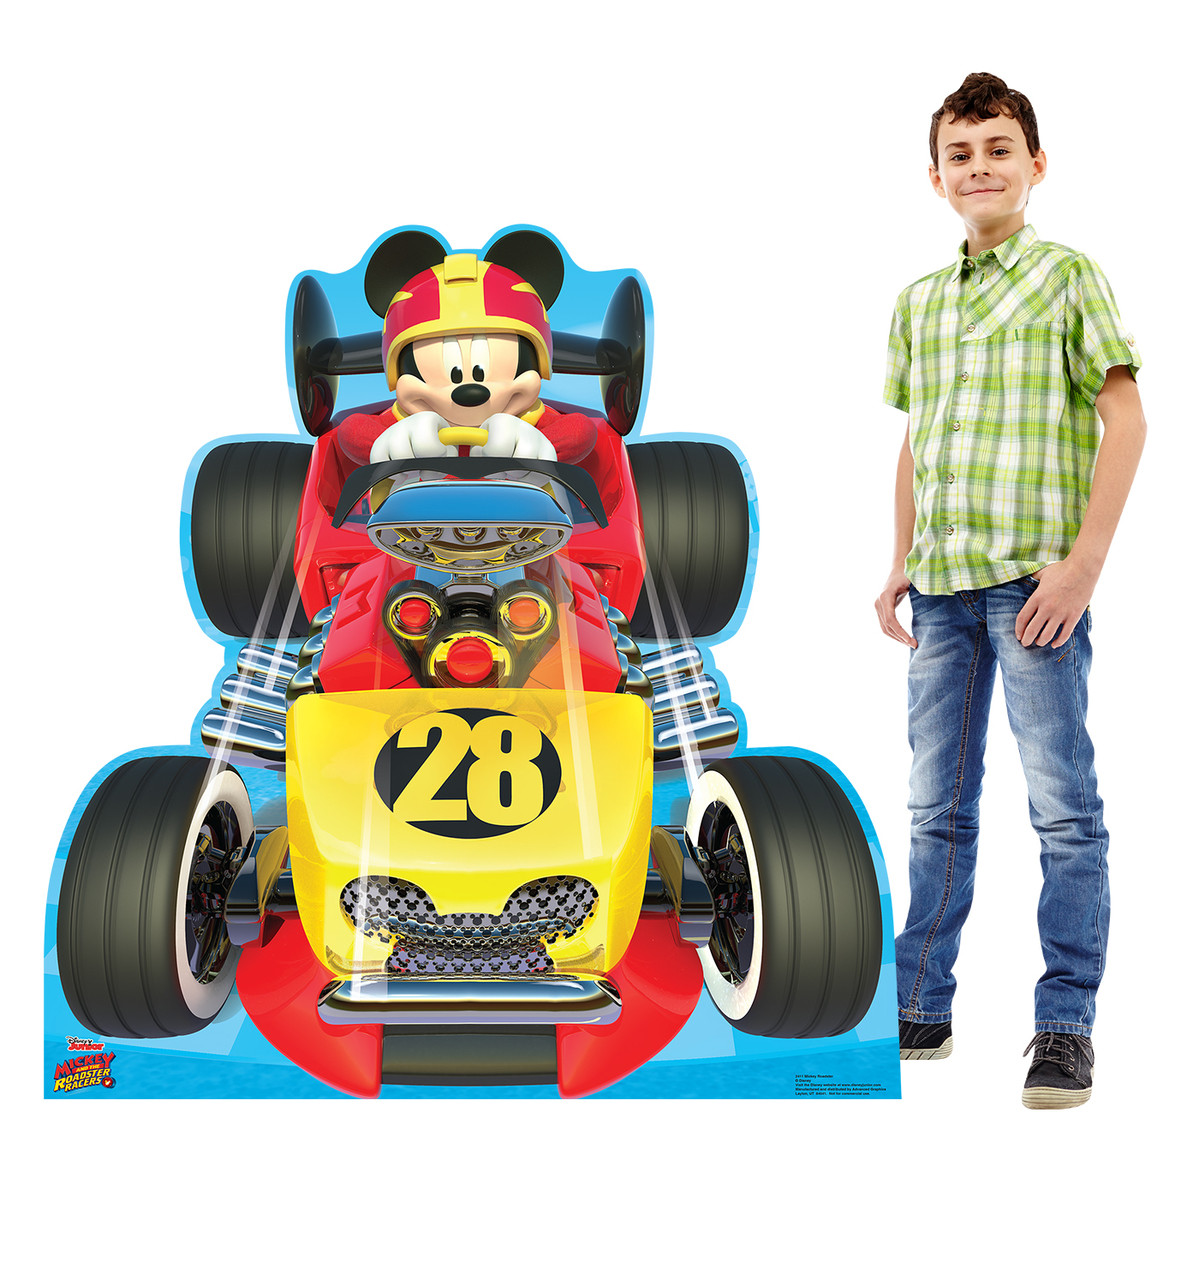 Life-size Mickey Roadster (Disney's Roadster Racers) Cardboard Standup | Cardboard Cutout 2